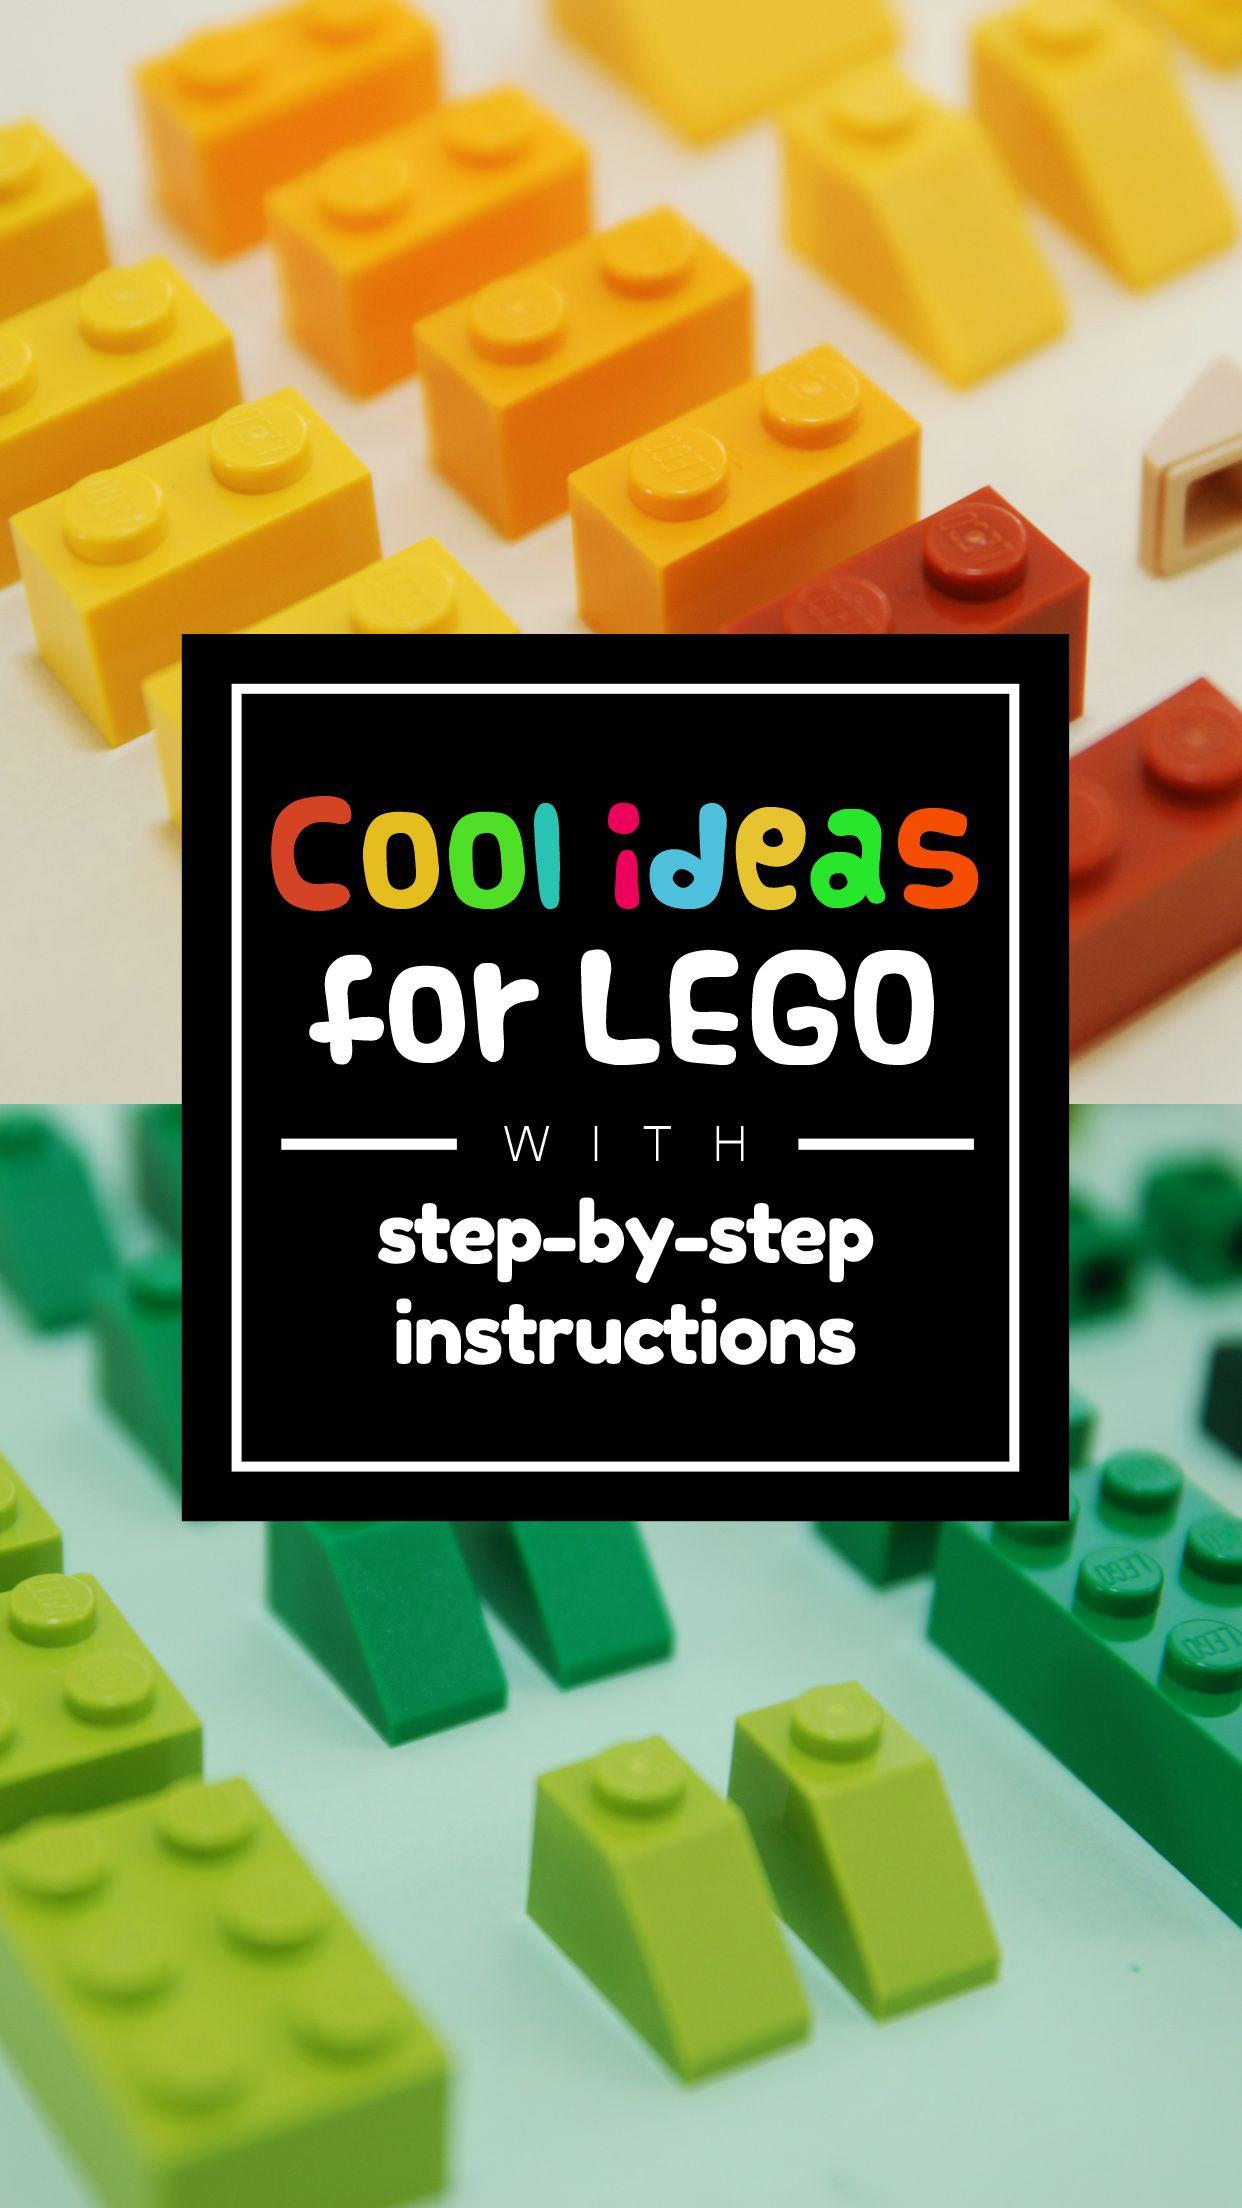 Pin By Twistedmanes On Lego Pinterest Lego Models Lego And App